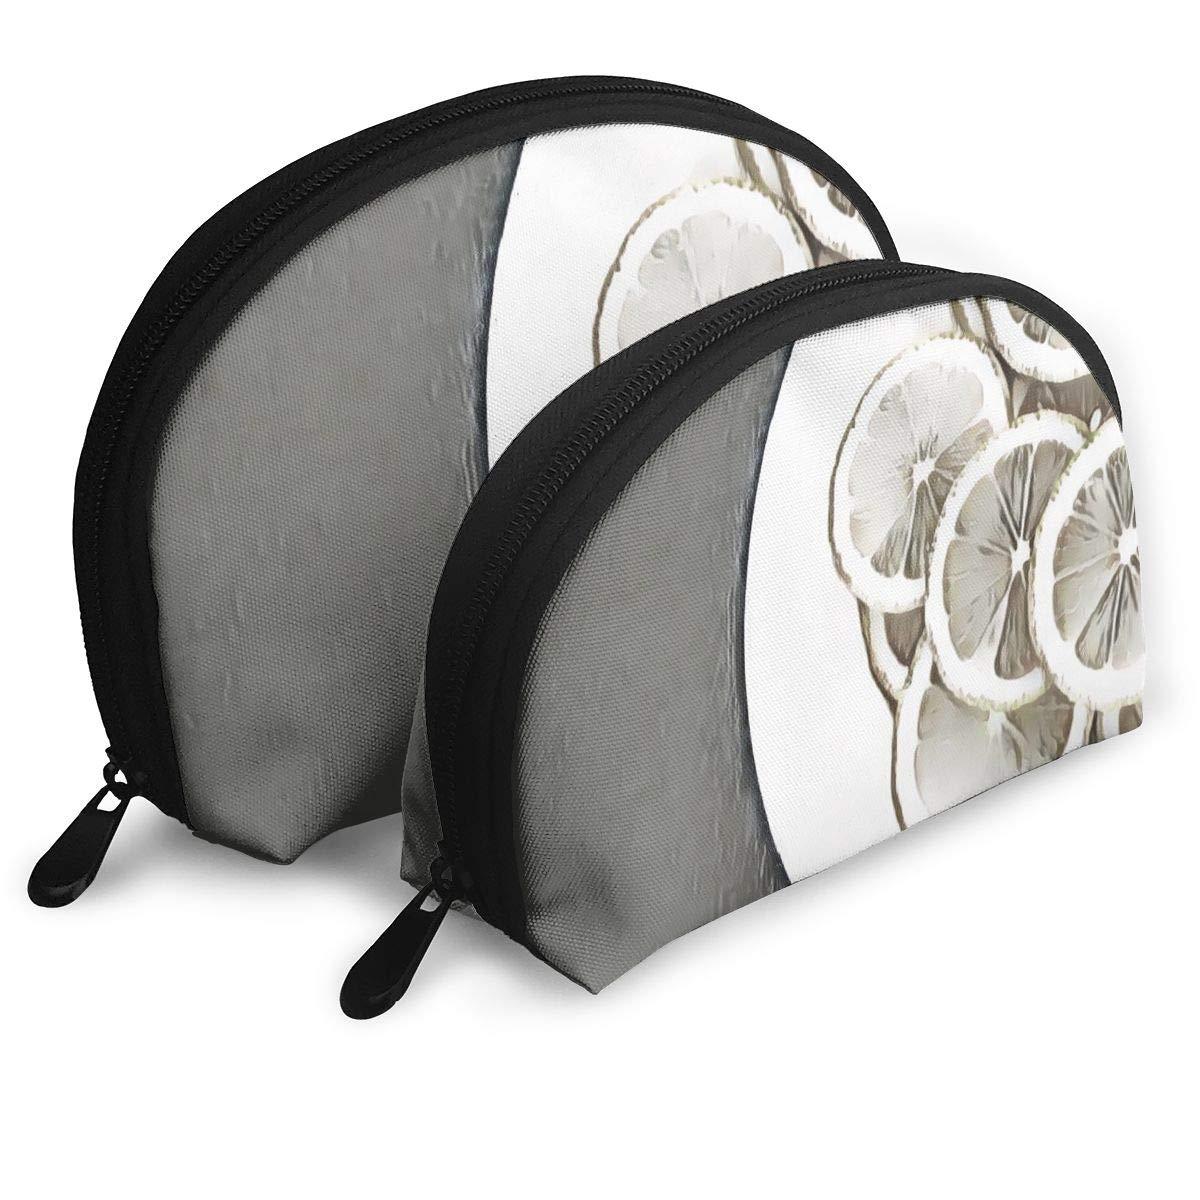 HJDKFIW Personalized Slices of Lemon On White Plate Womens Shell Shape Clutch Bag Organizer Bag Gift 2Pcs